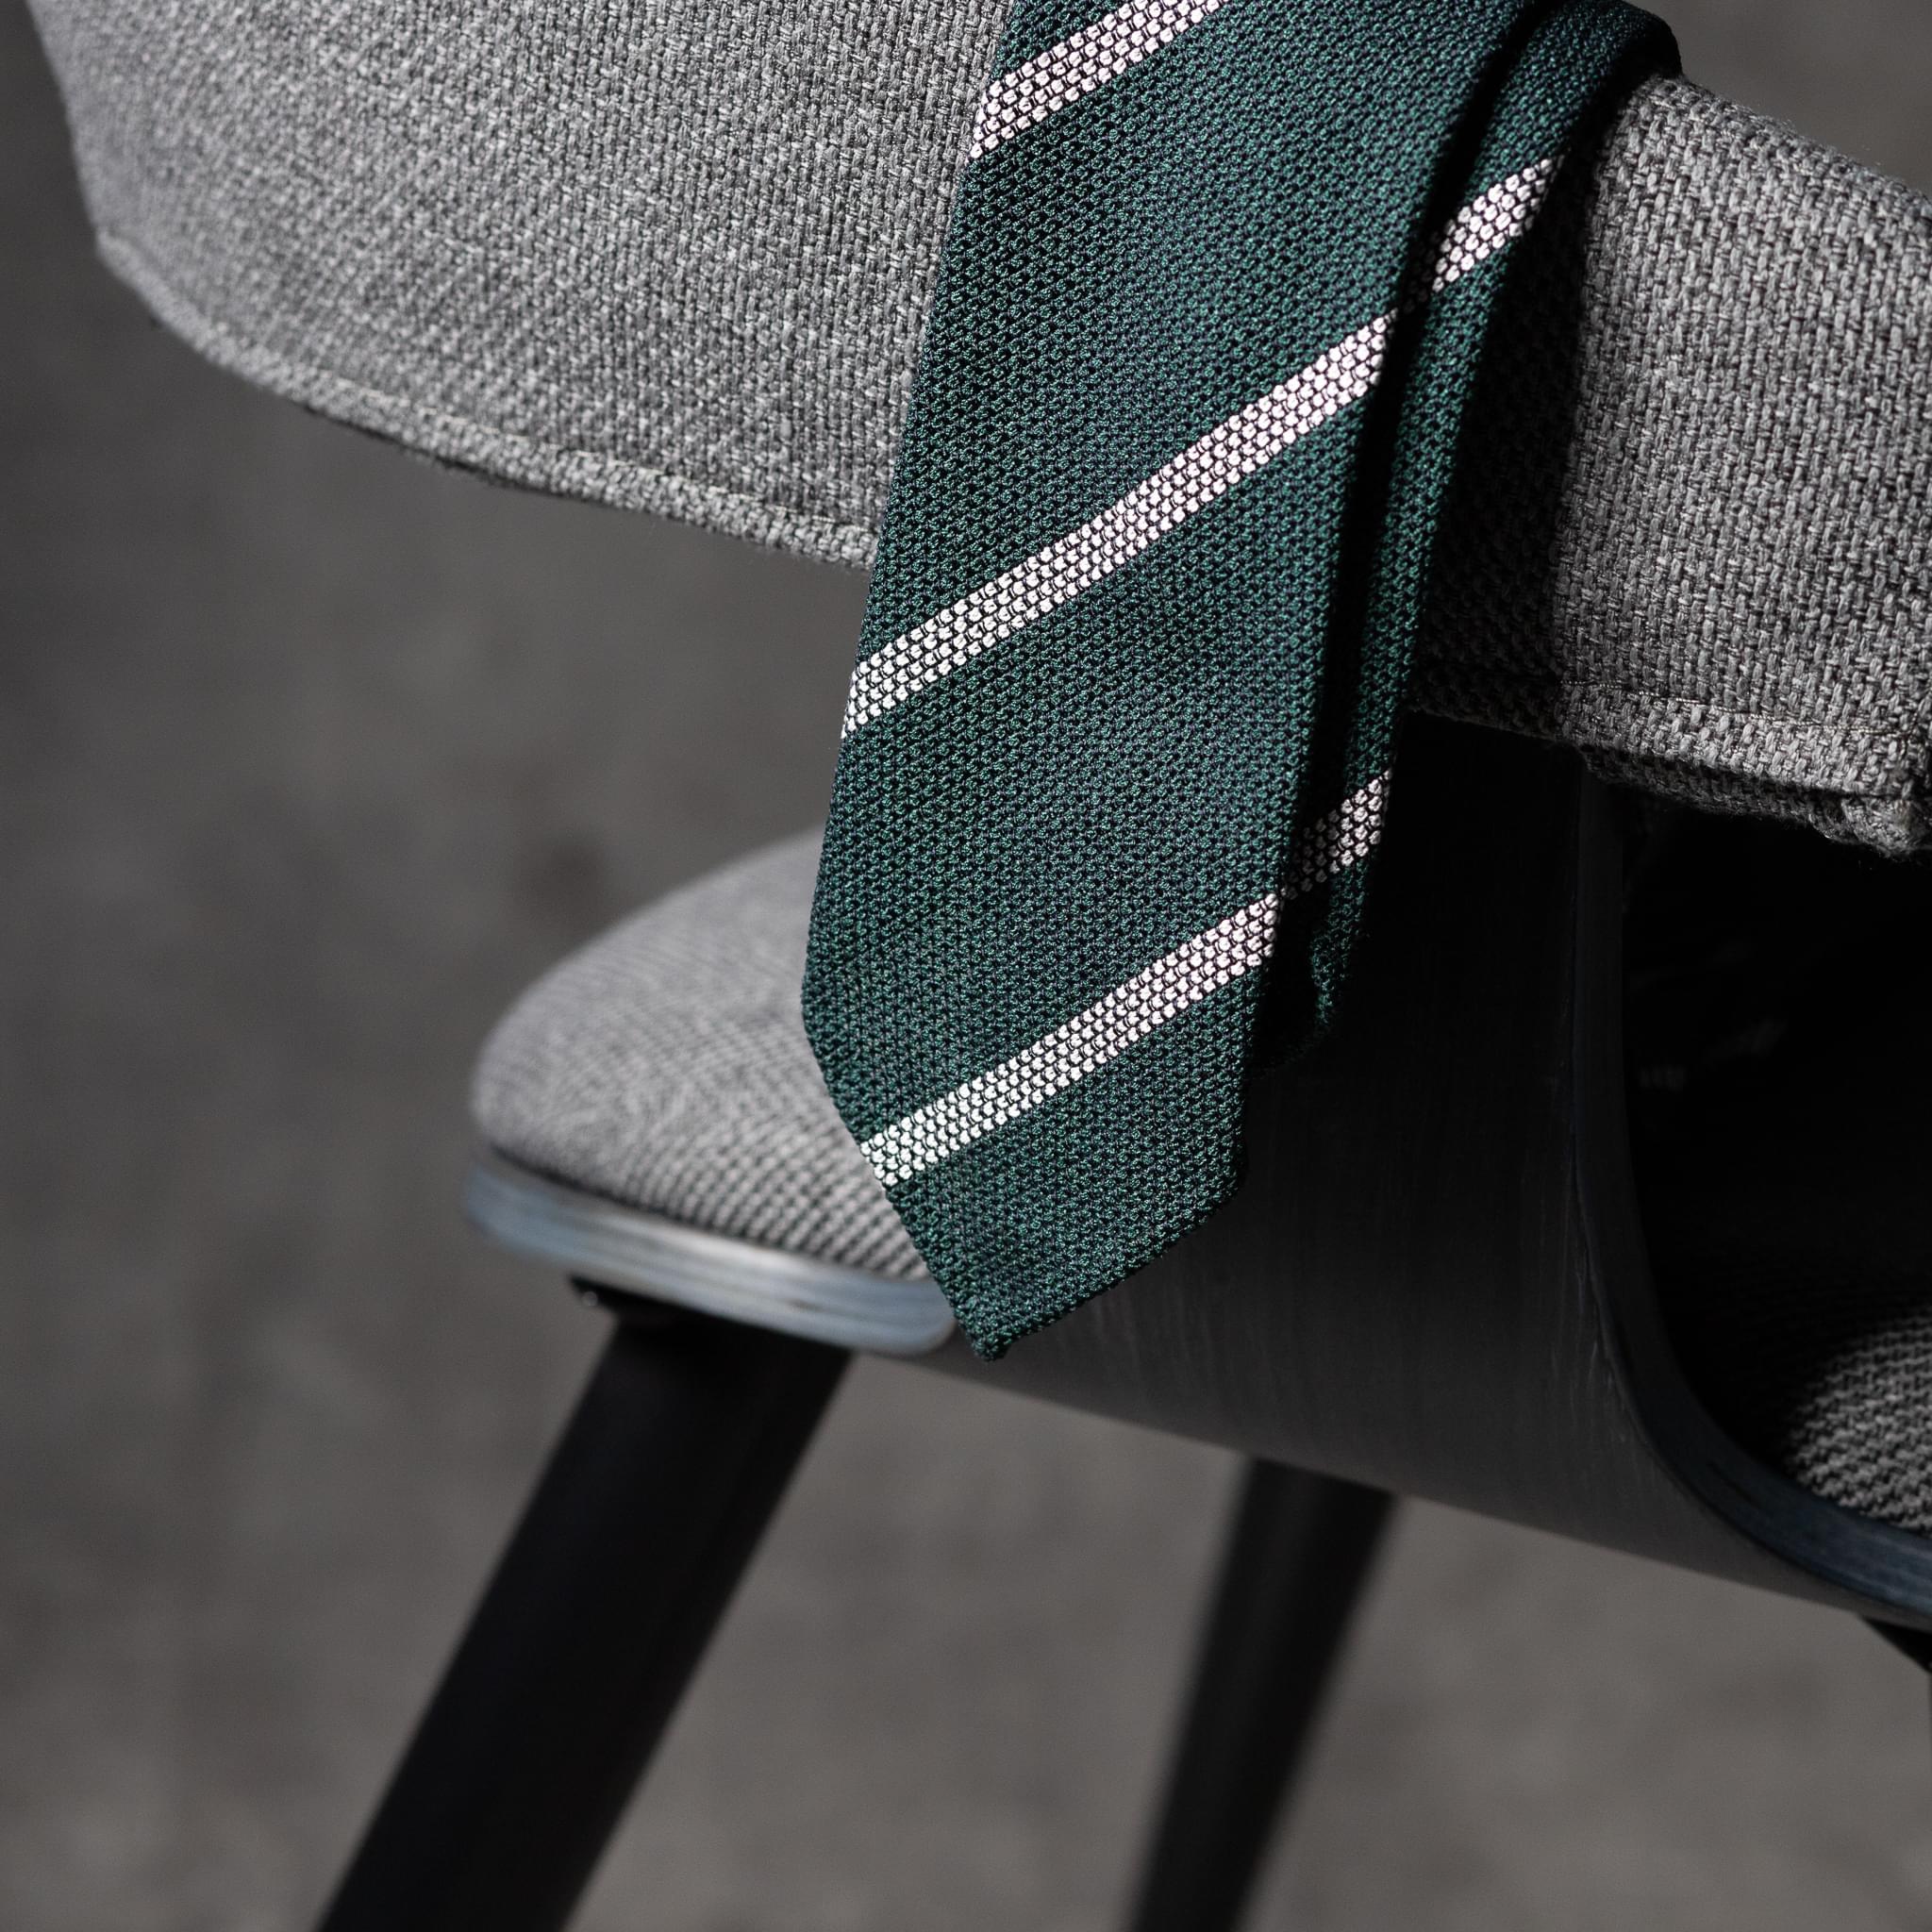 BOUCLÉ-0443-Tie-Initials-Corbata-Iniciales-The-Seelk-2